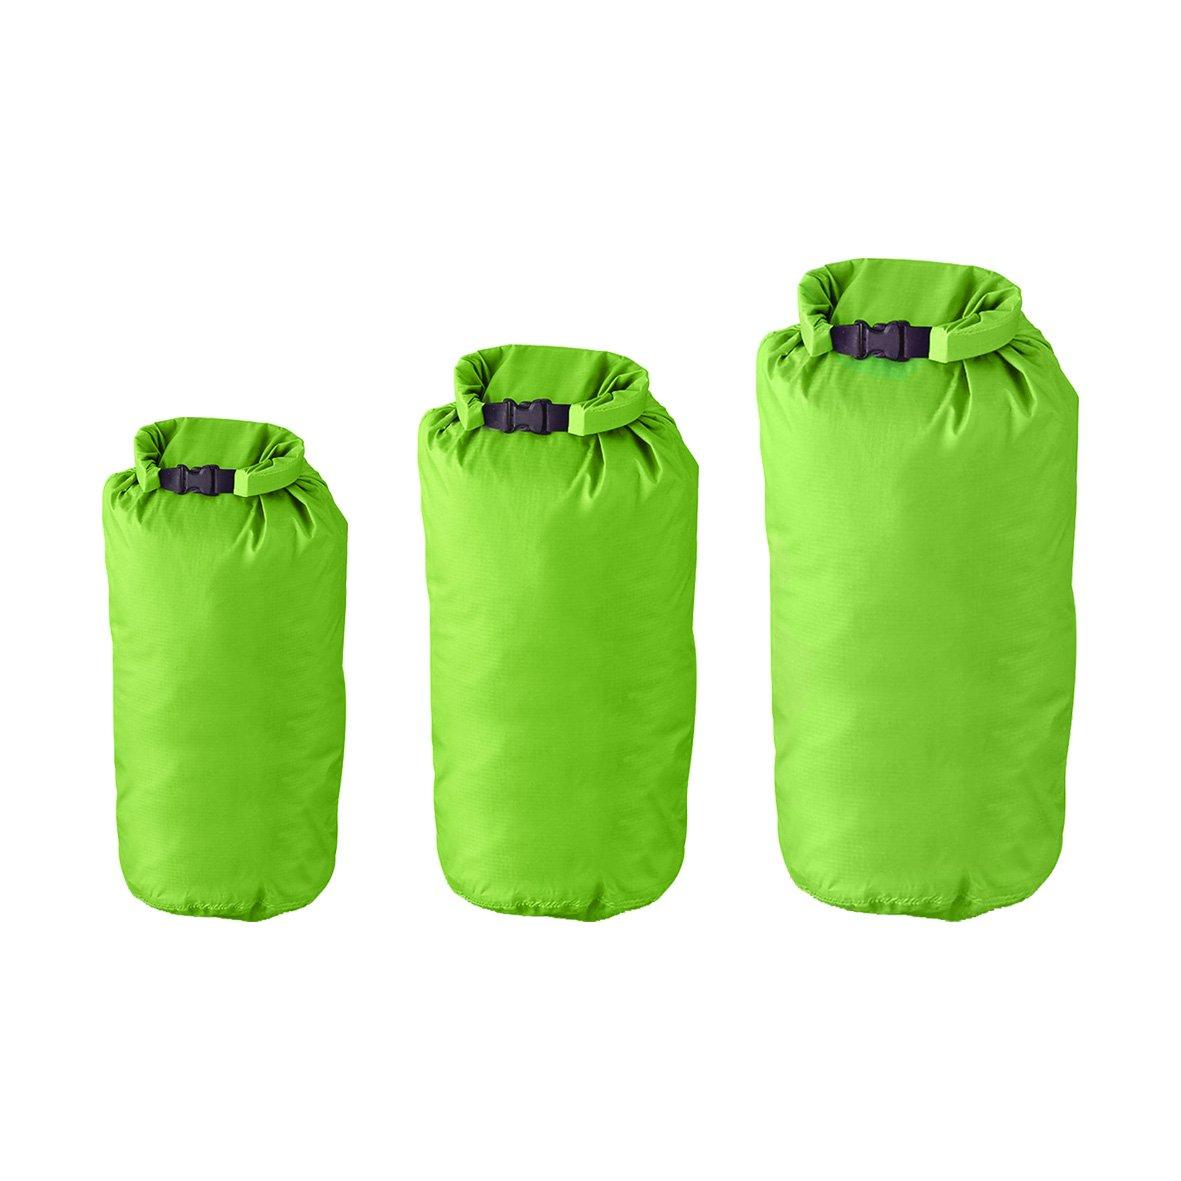 Milestone Camping Sacos secos (paquete de 3) - Verde Benross 20610